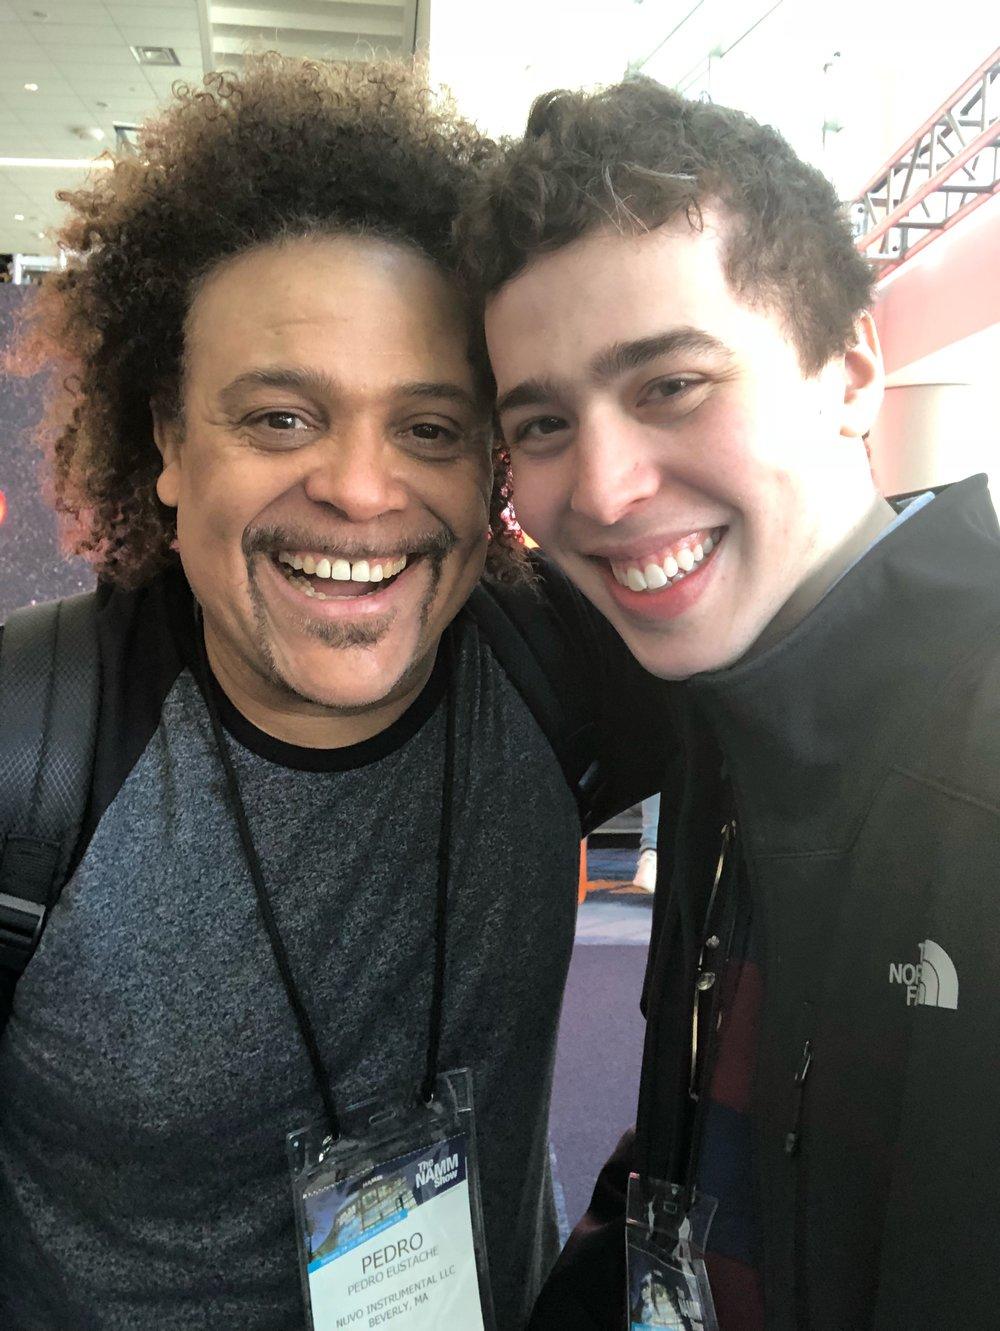 Ashton & Pedro Eustache